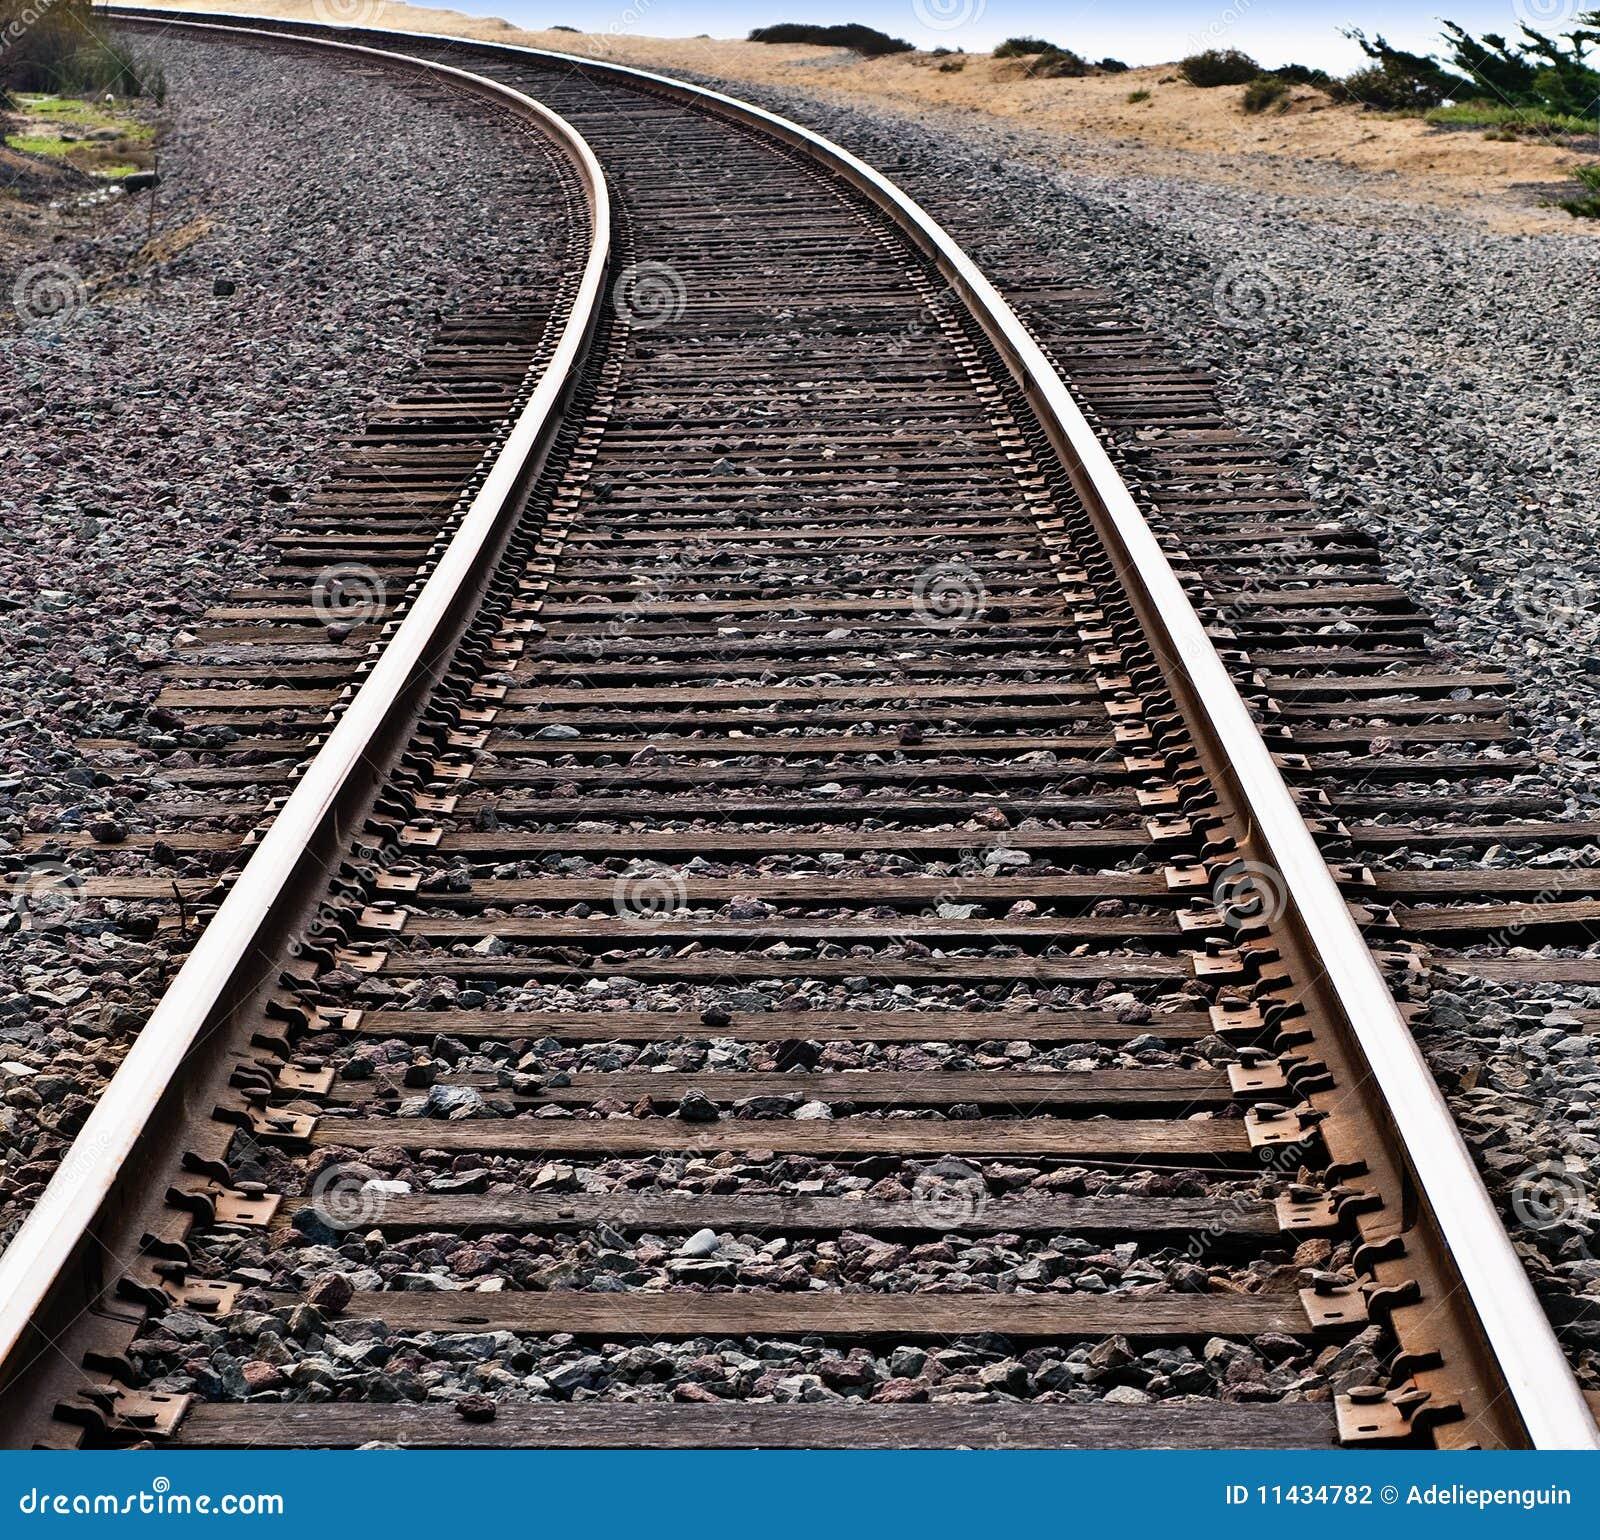 Train Tracks Around a Curve